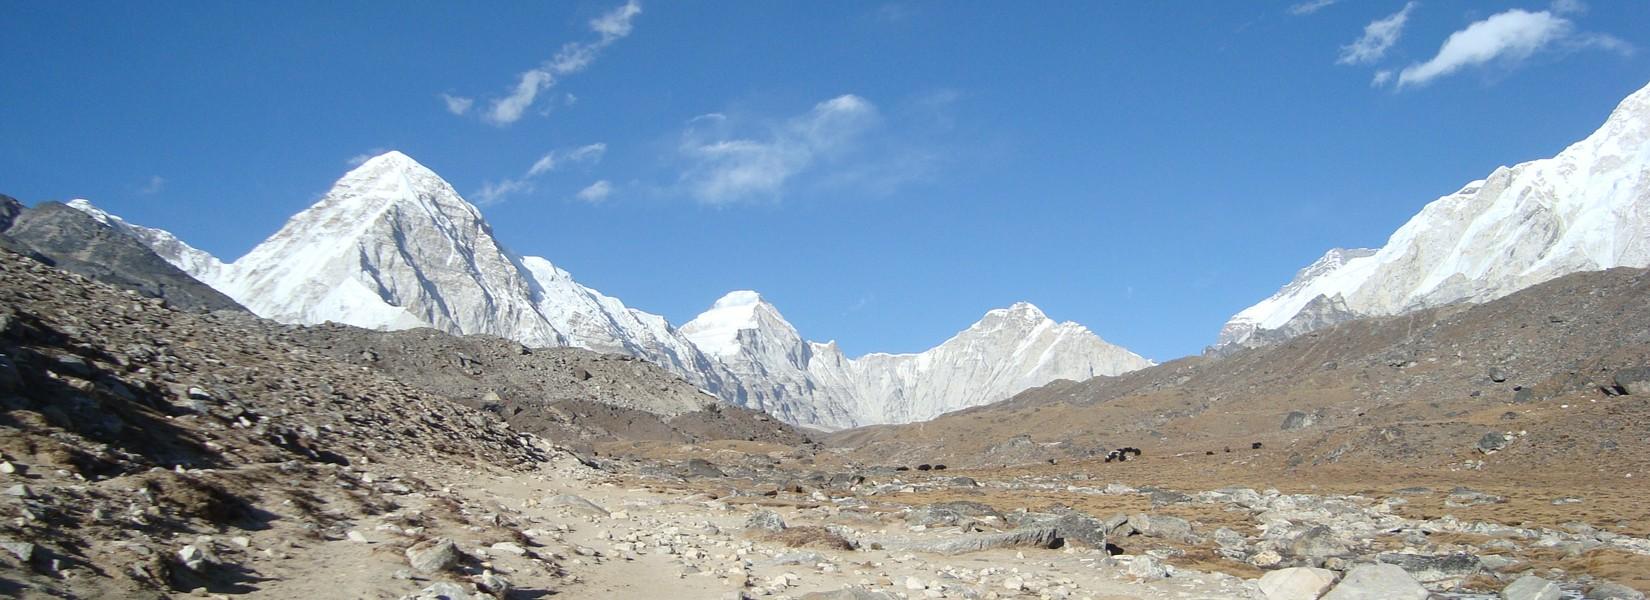 Everest Base Camp Trekking Itinerary 2021 | 2022